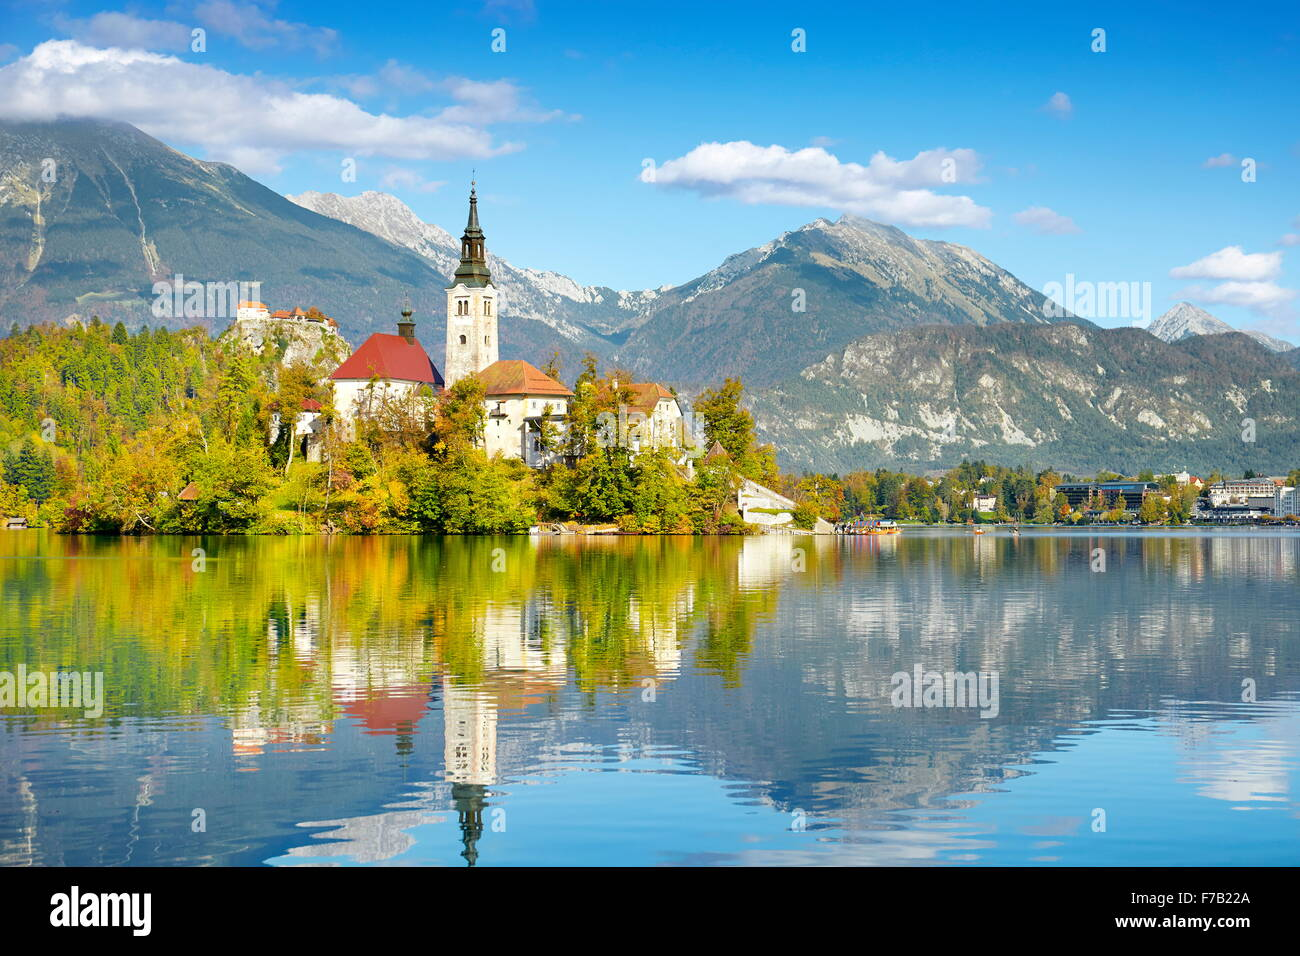 Otoño Lago Bled, Alpes Julianos, Eslovenia Imagen De Stock